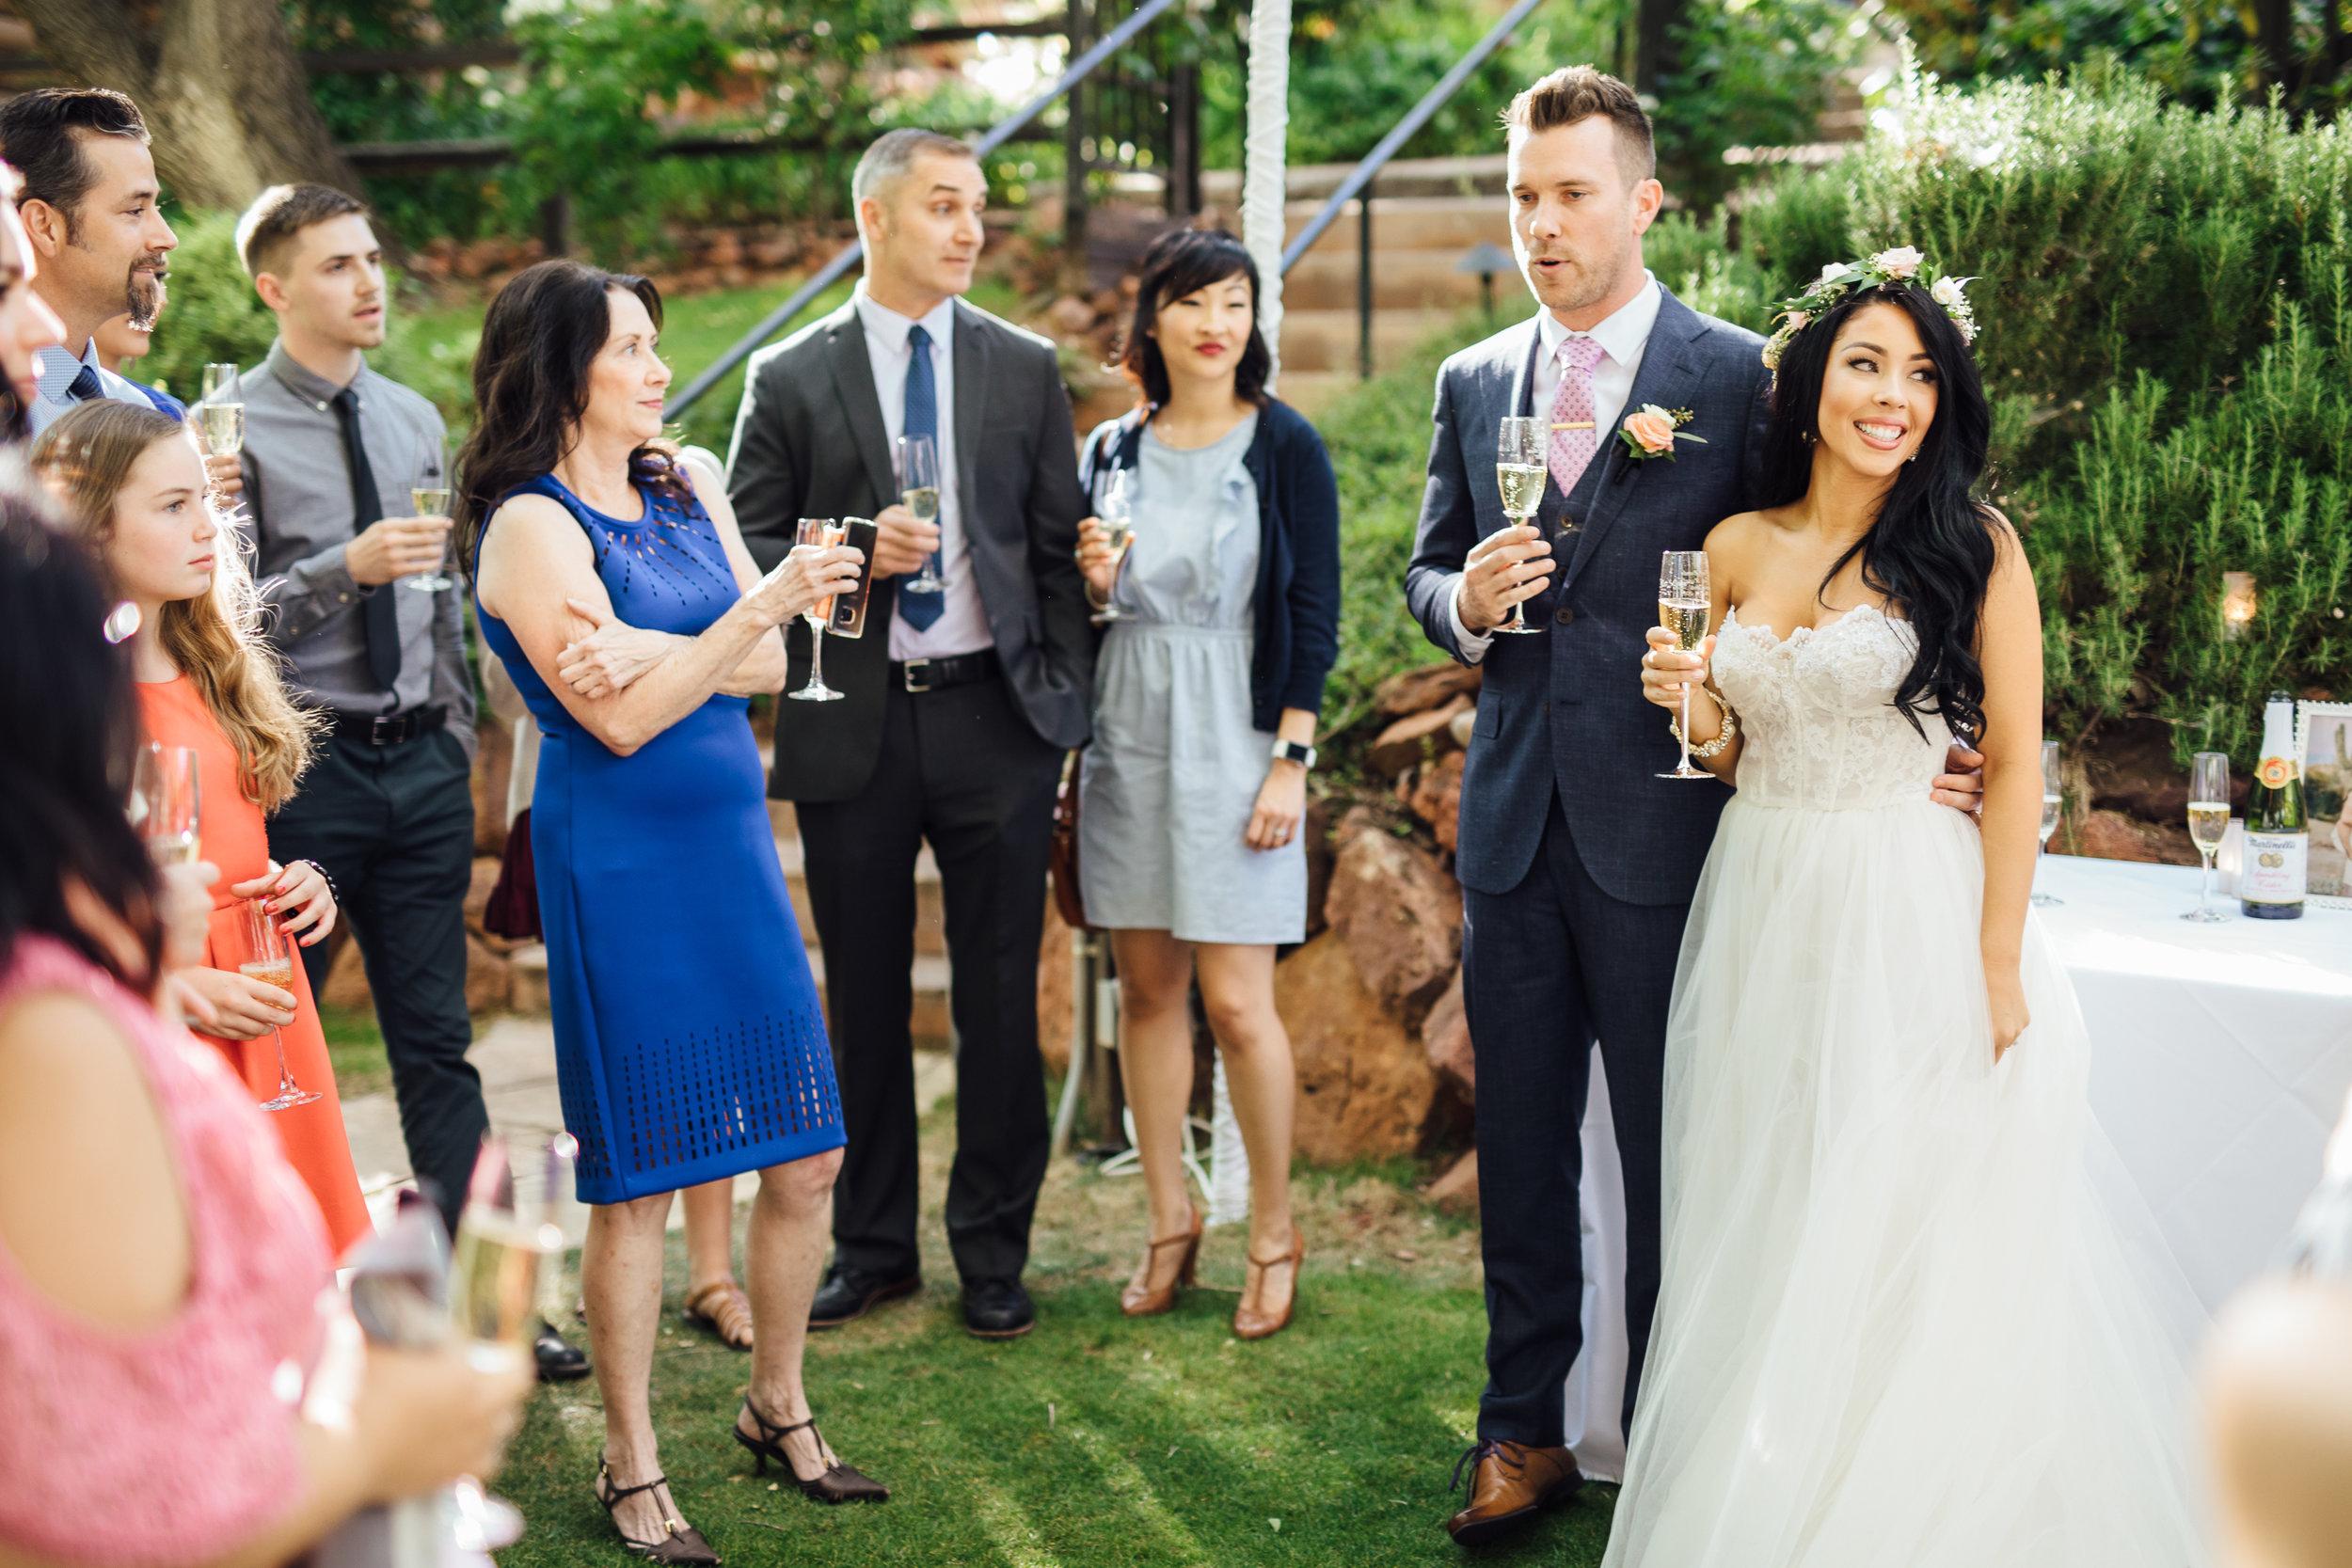 LMW-Sedona-lauberge-wedding-6988.jpg